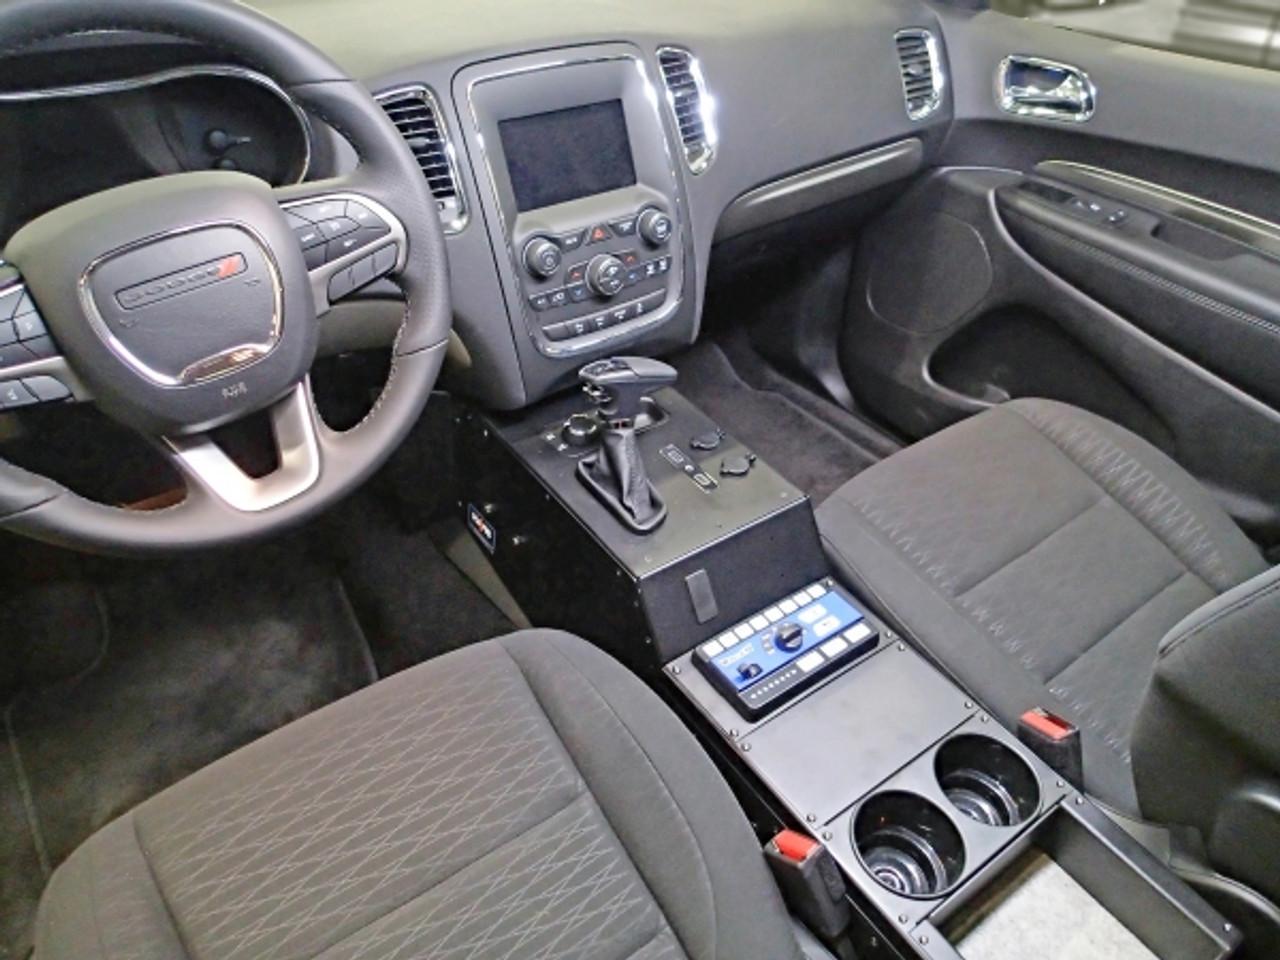 Havis 2018 2020 Dodge Durango 20 Inch Equipment Console C Vs 1800 Dur 1 Accepts Oem